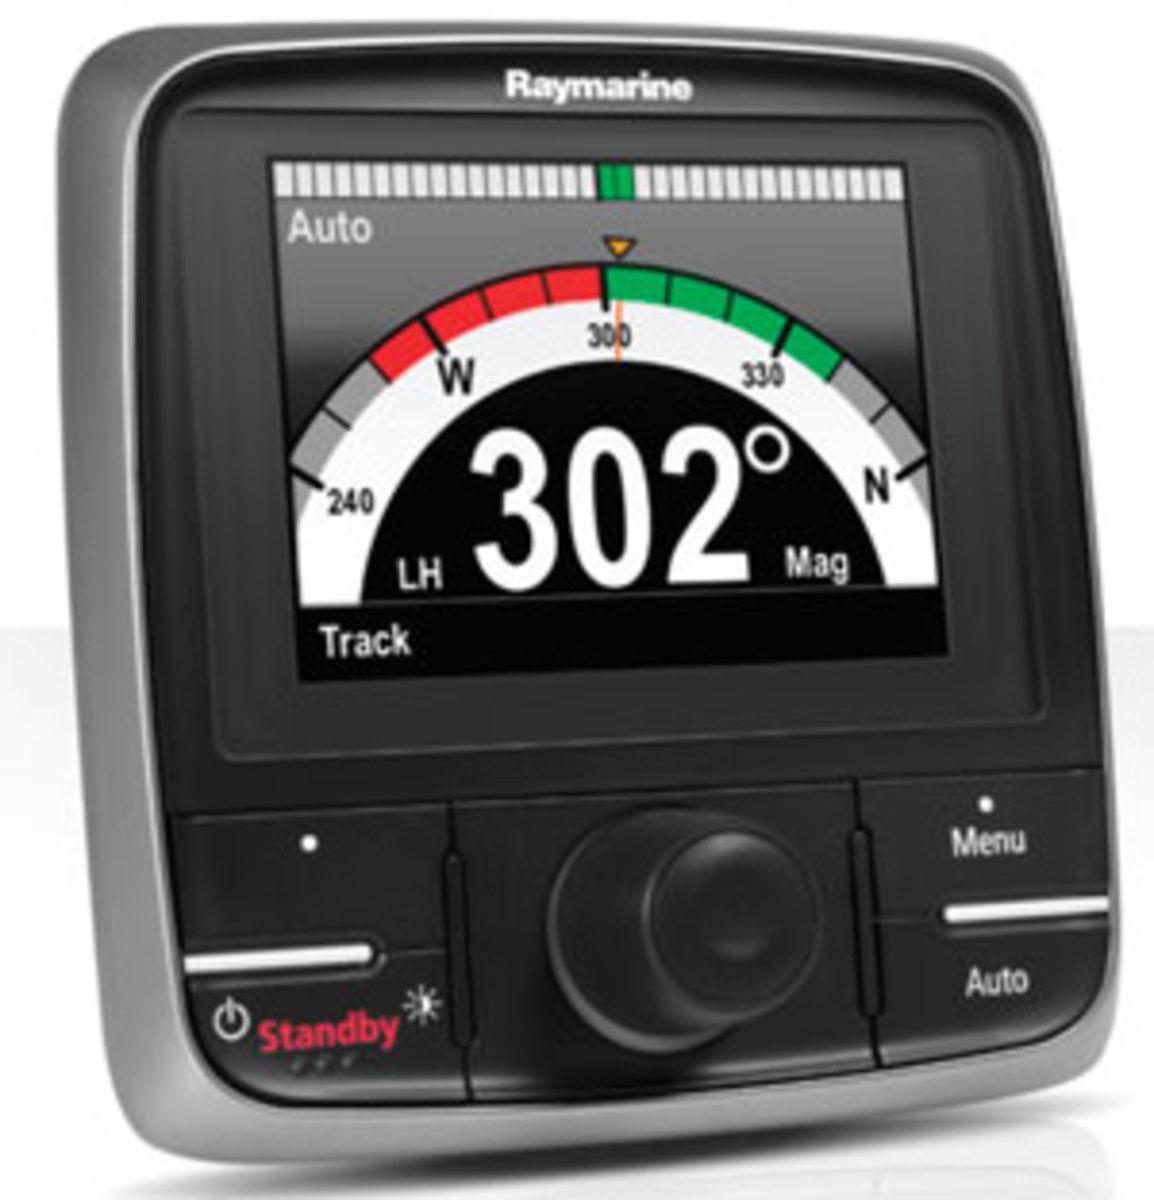 Raymarine's Evolution autopilot control